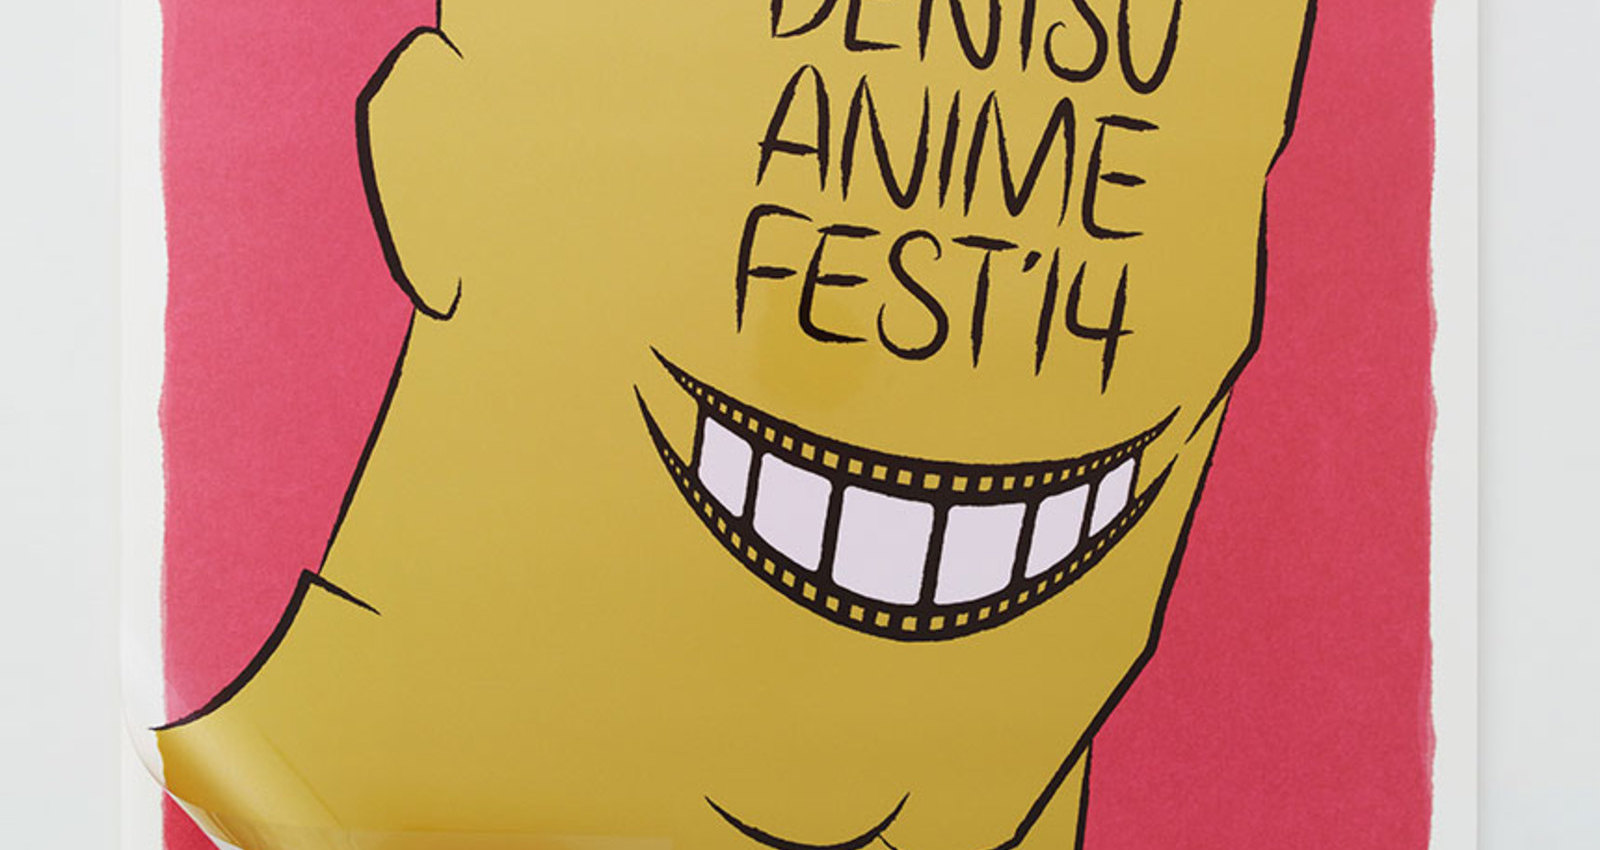 DENTSU ANIME FEST